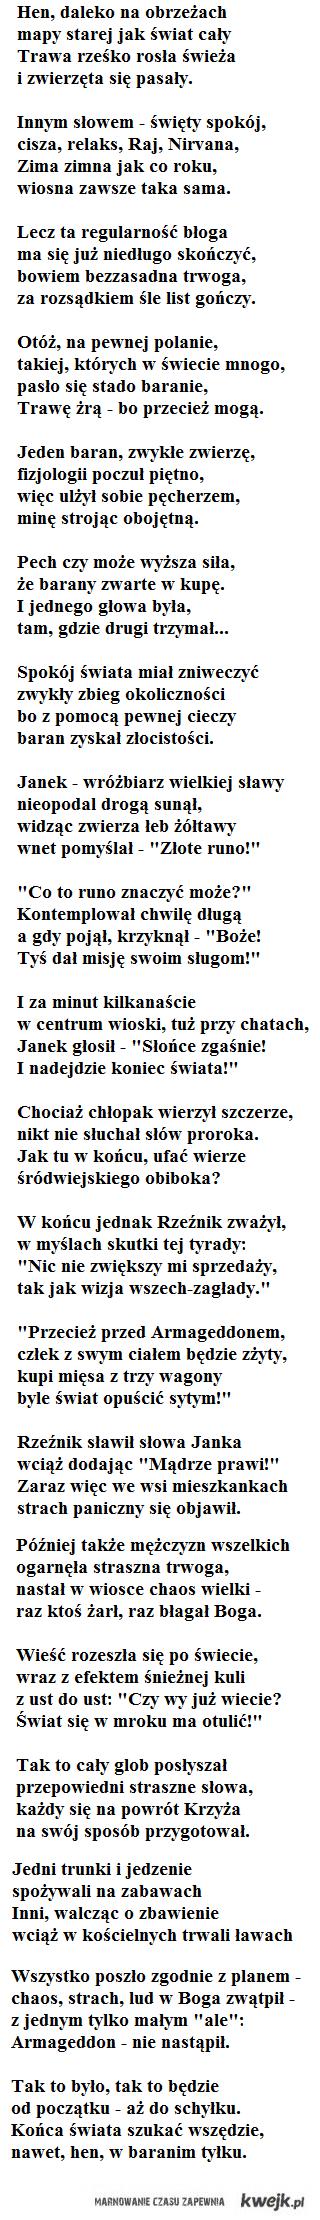 Hymn o końcu świata